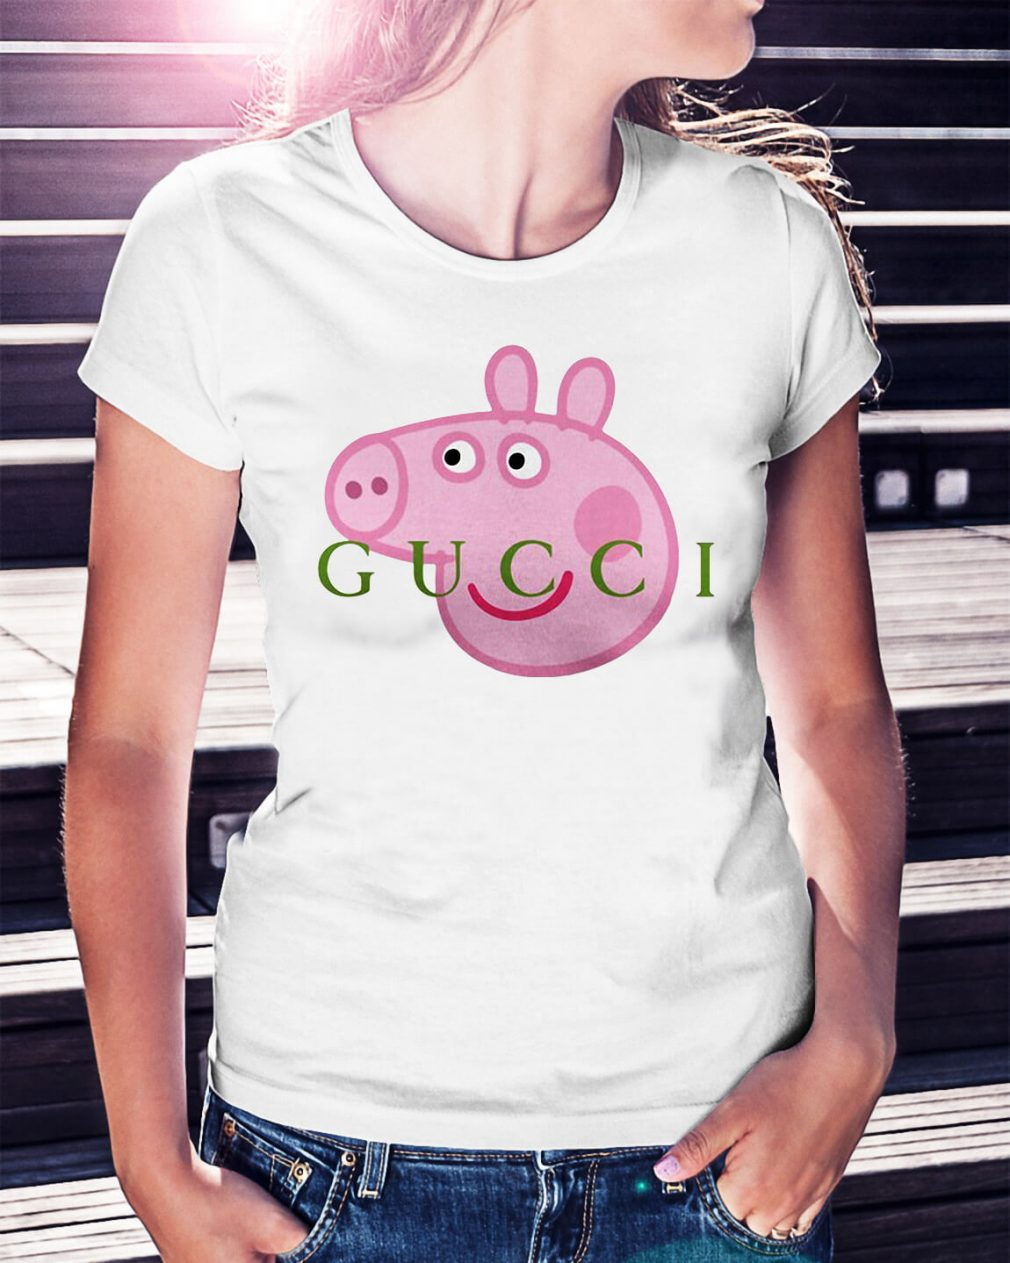 Gucci peppa pig shirt